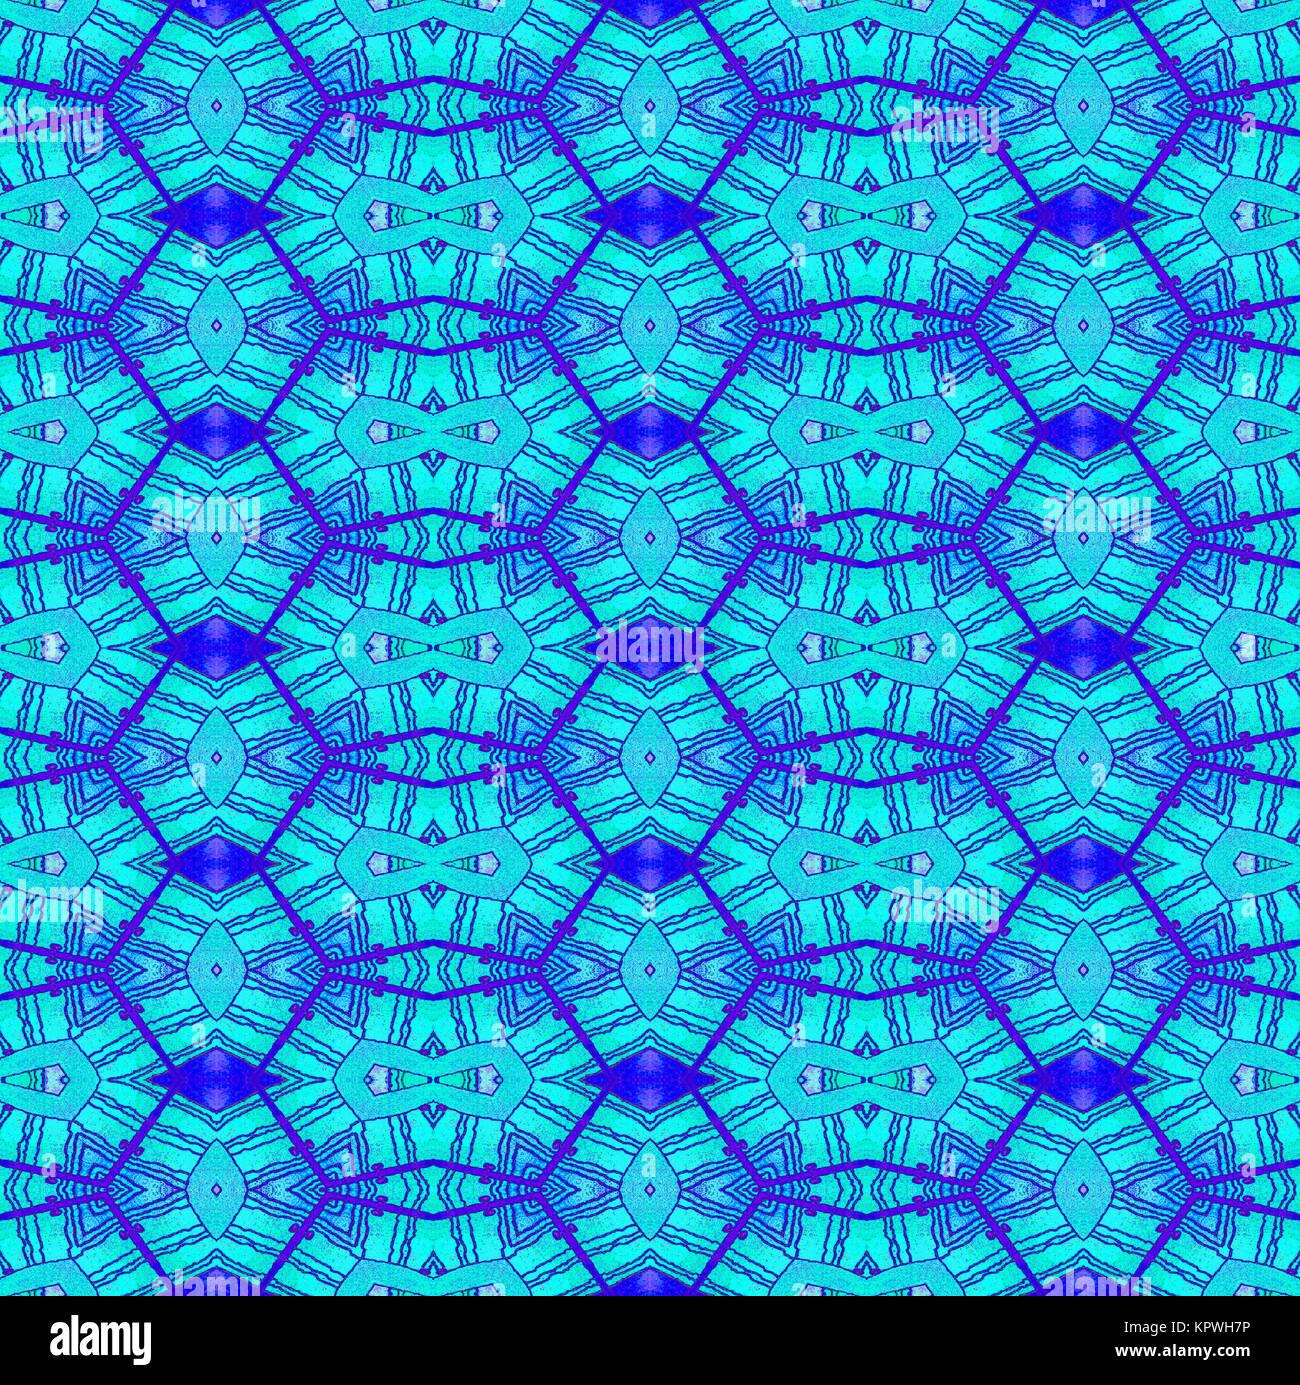 abstract geometric octagon shape - photo #7